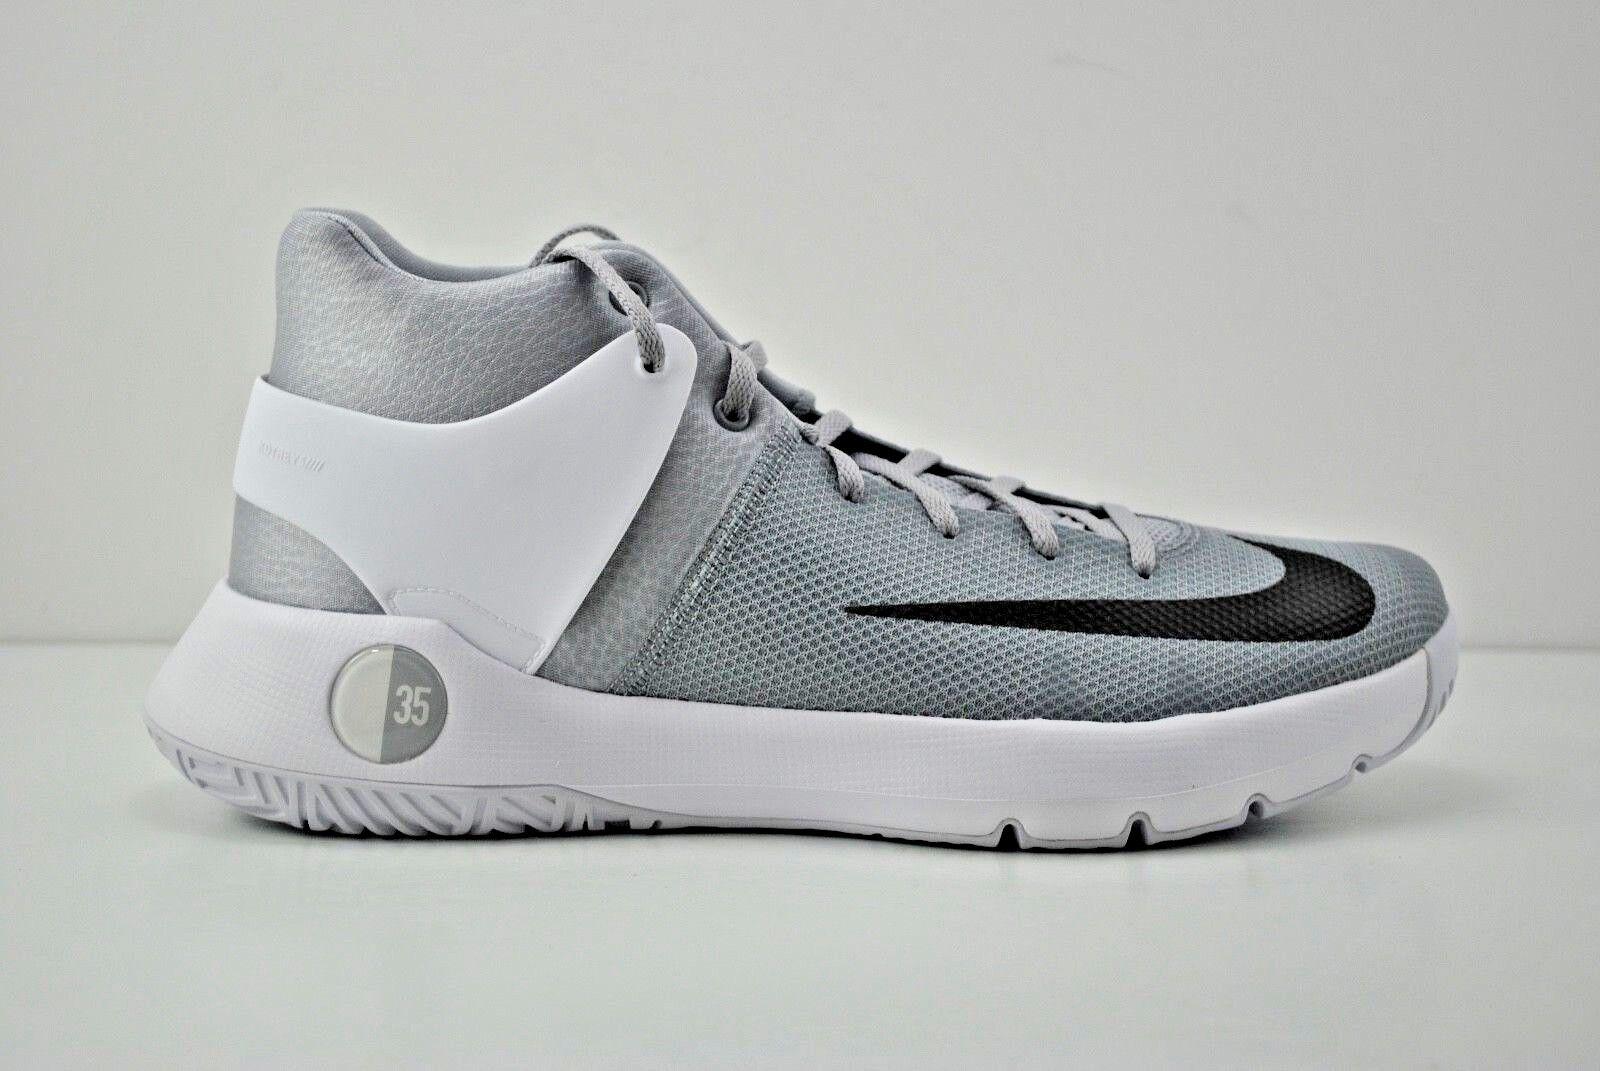 2c382627103 Nike Men s KD Trey 5 IV TB Basketball Shoes - Wolf Grey black-white ...